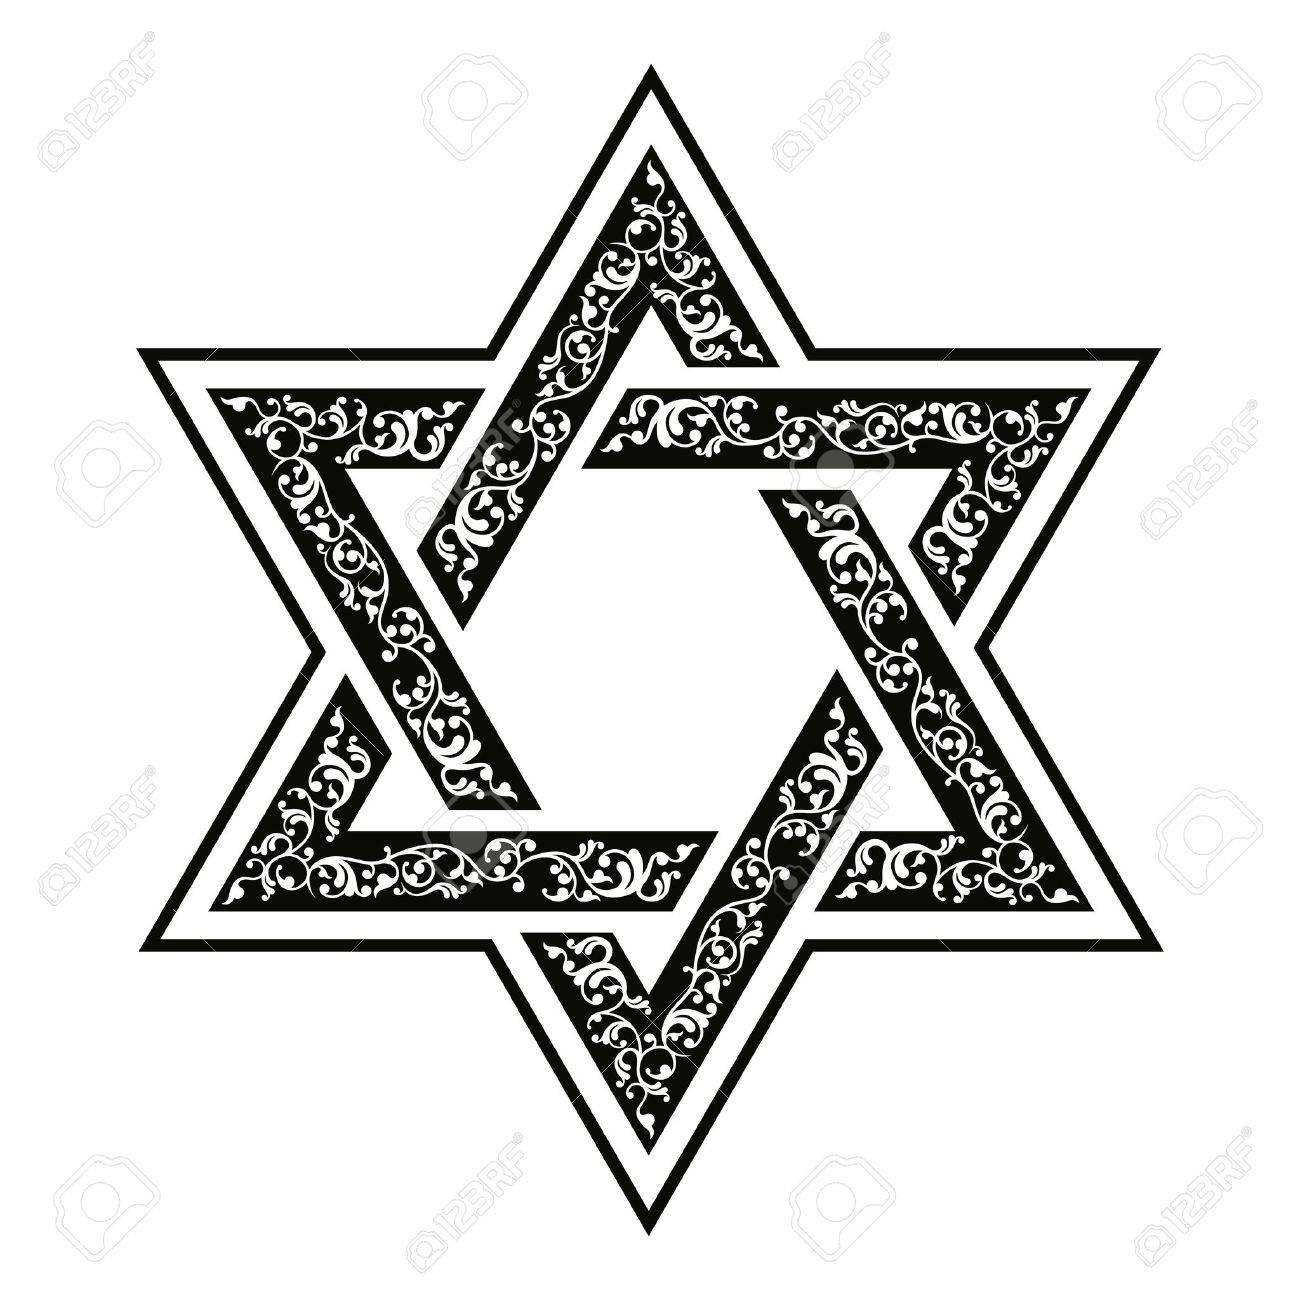 vector hexagonal star of david with oriental ornaments royalty free rh 123rf com Christmas Ornament Clip Art Star Tree Topper Clip Art